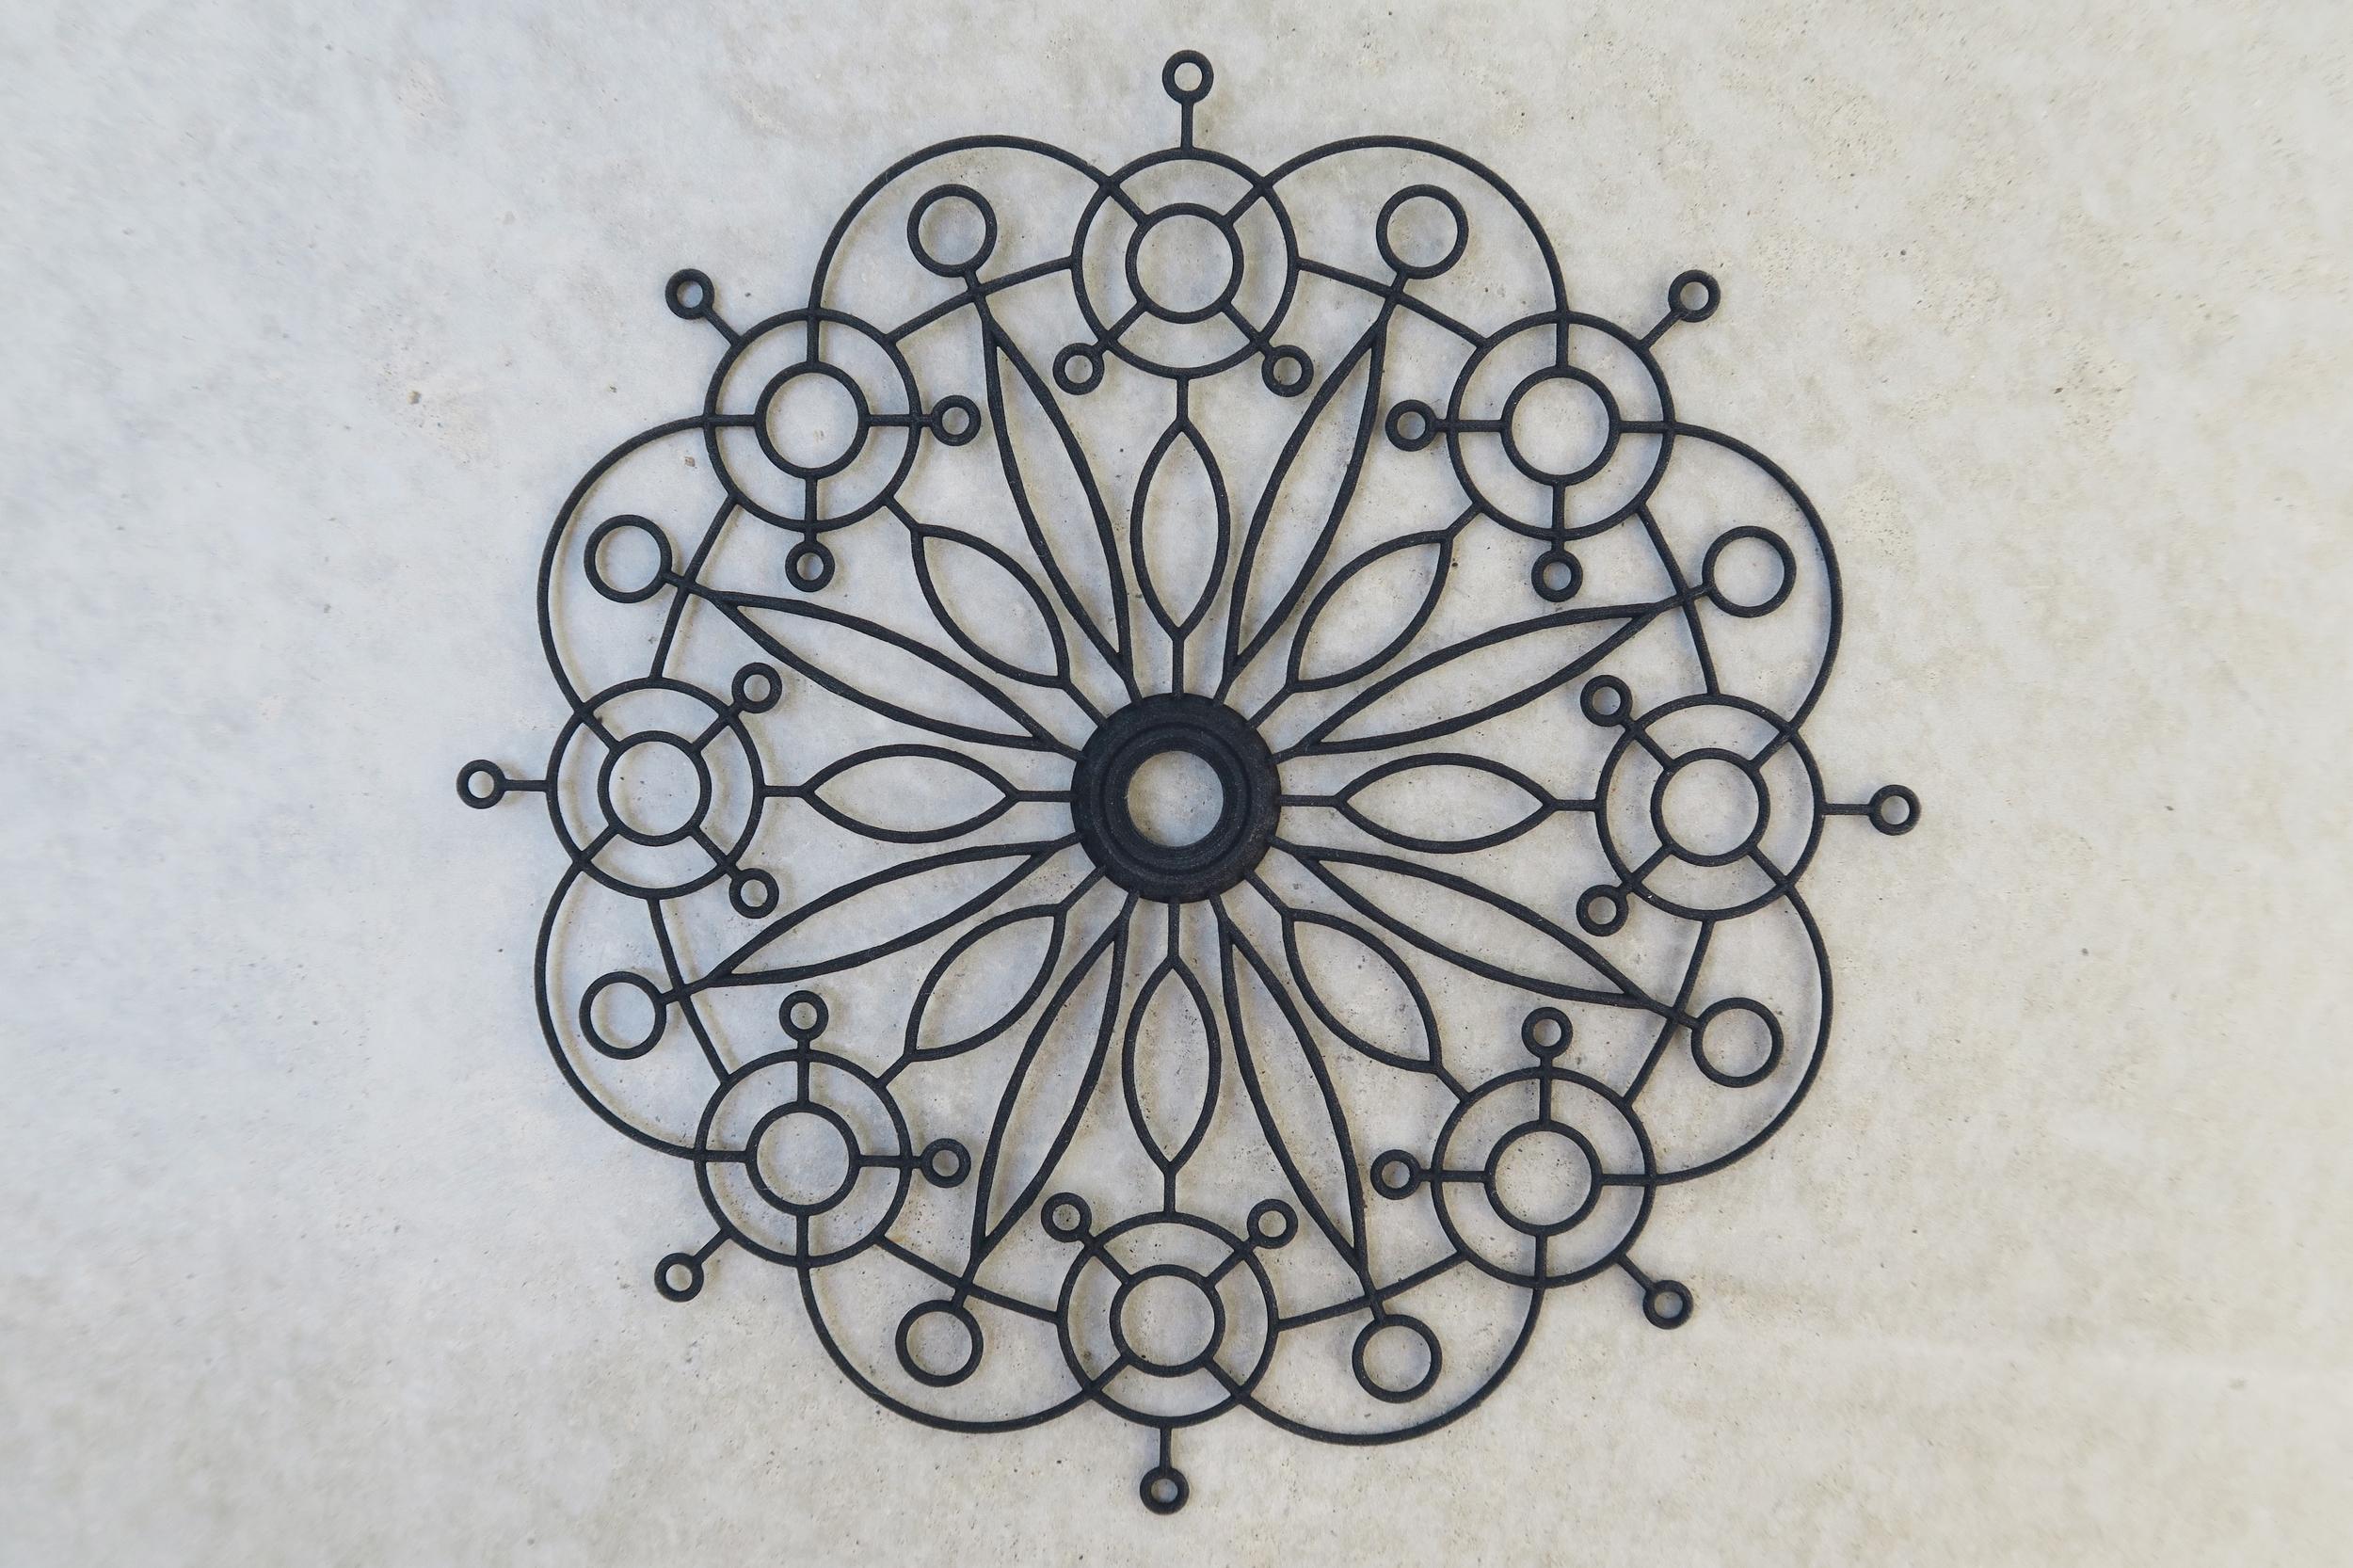 3D printed Flower Pattern Mandala 01